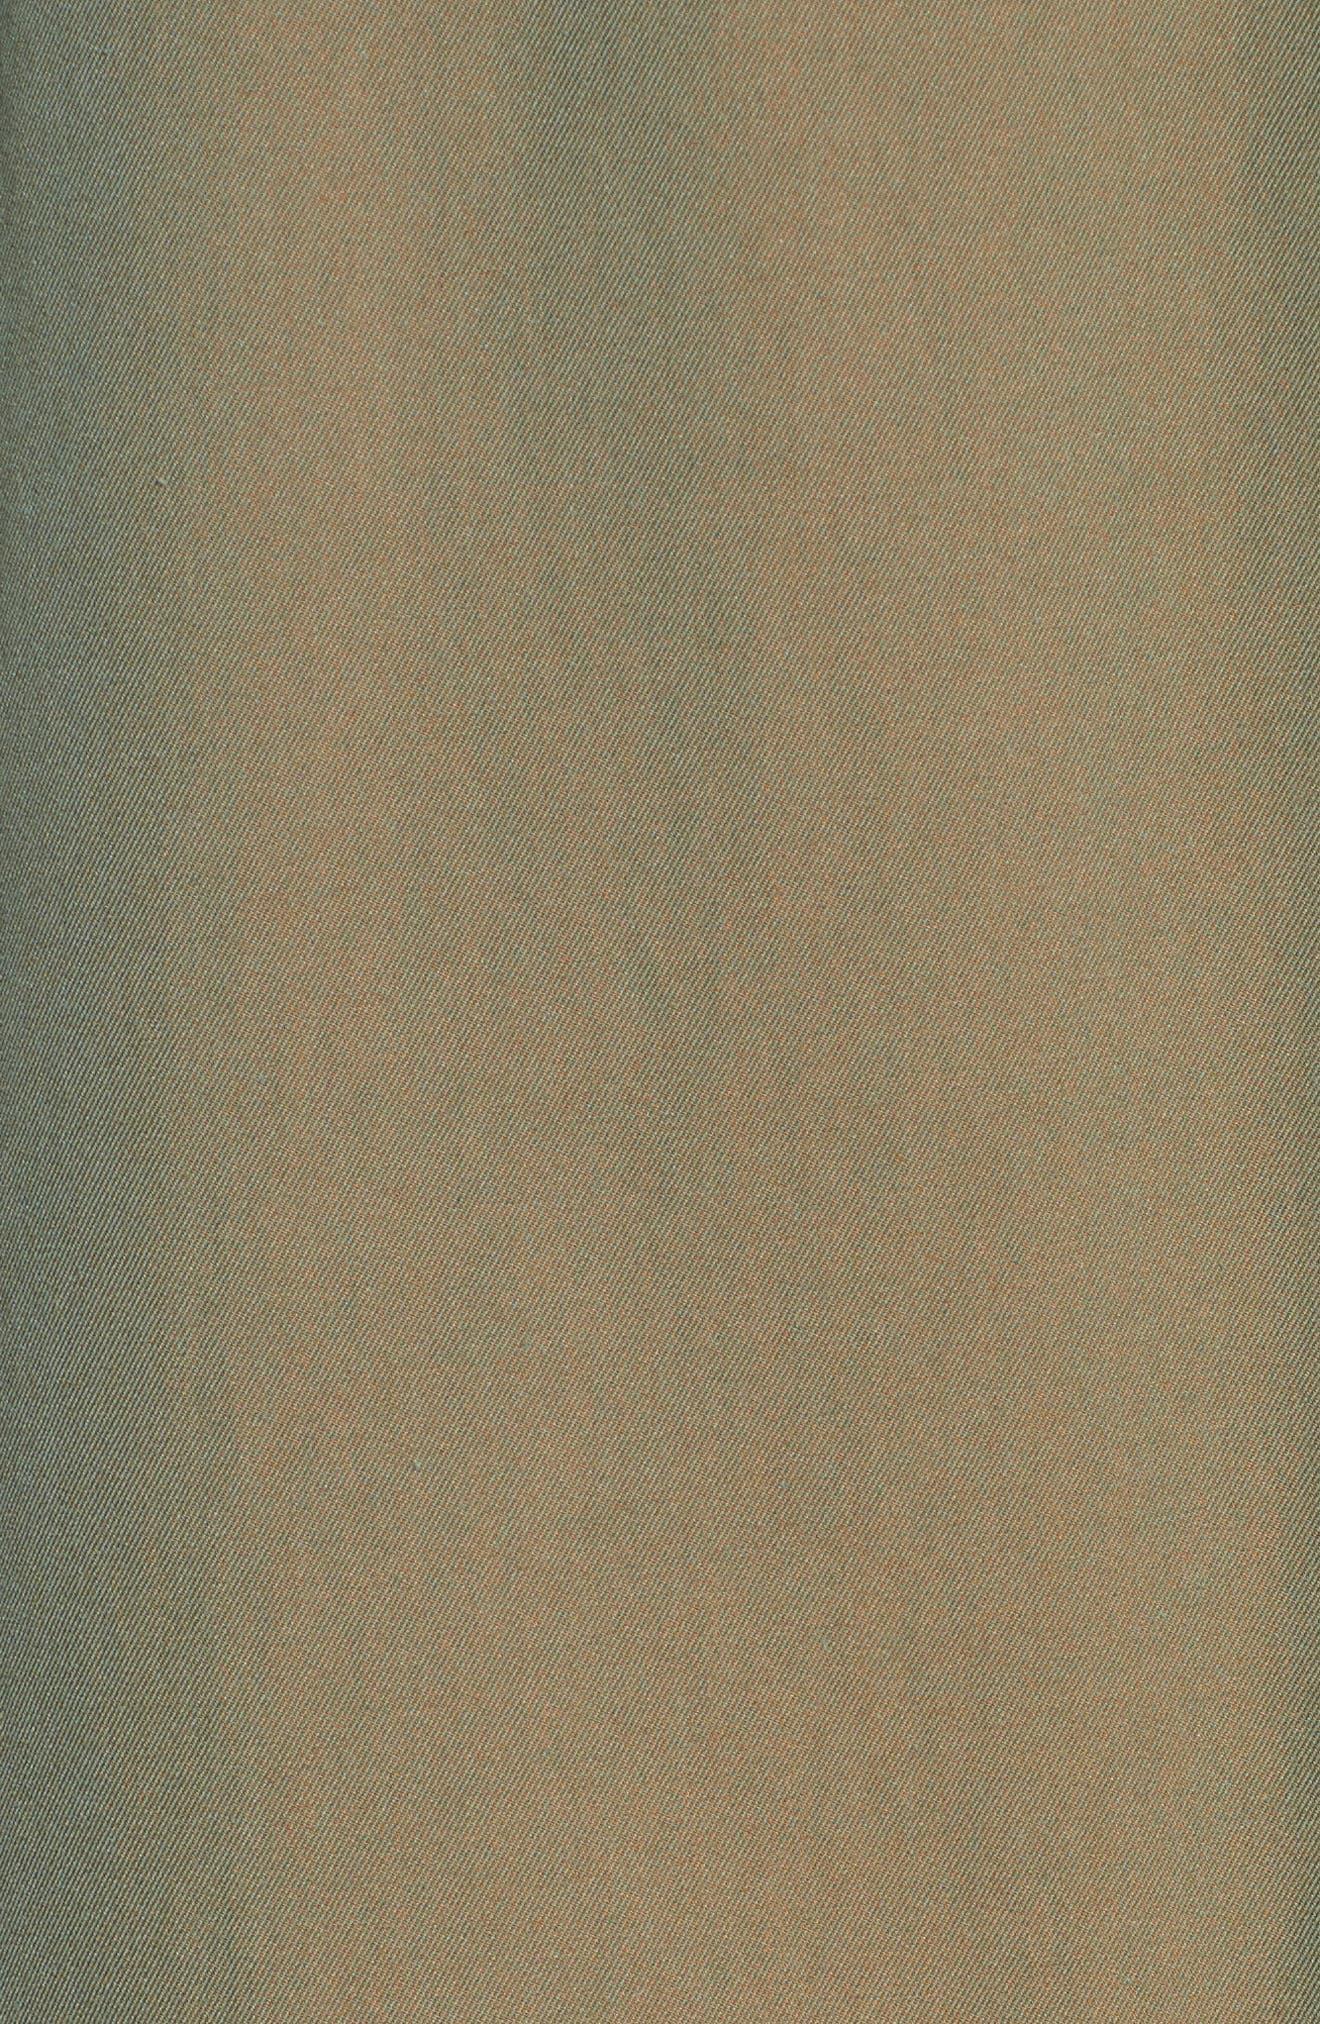 Allensford Raglan Trench Cape,                             Alternate thumbnail 6, color,                             317